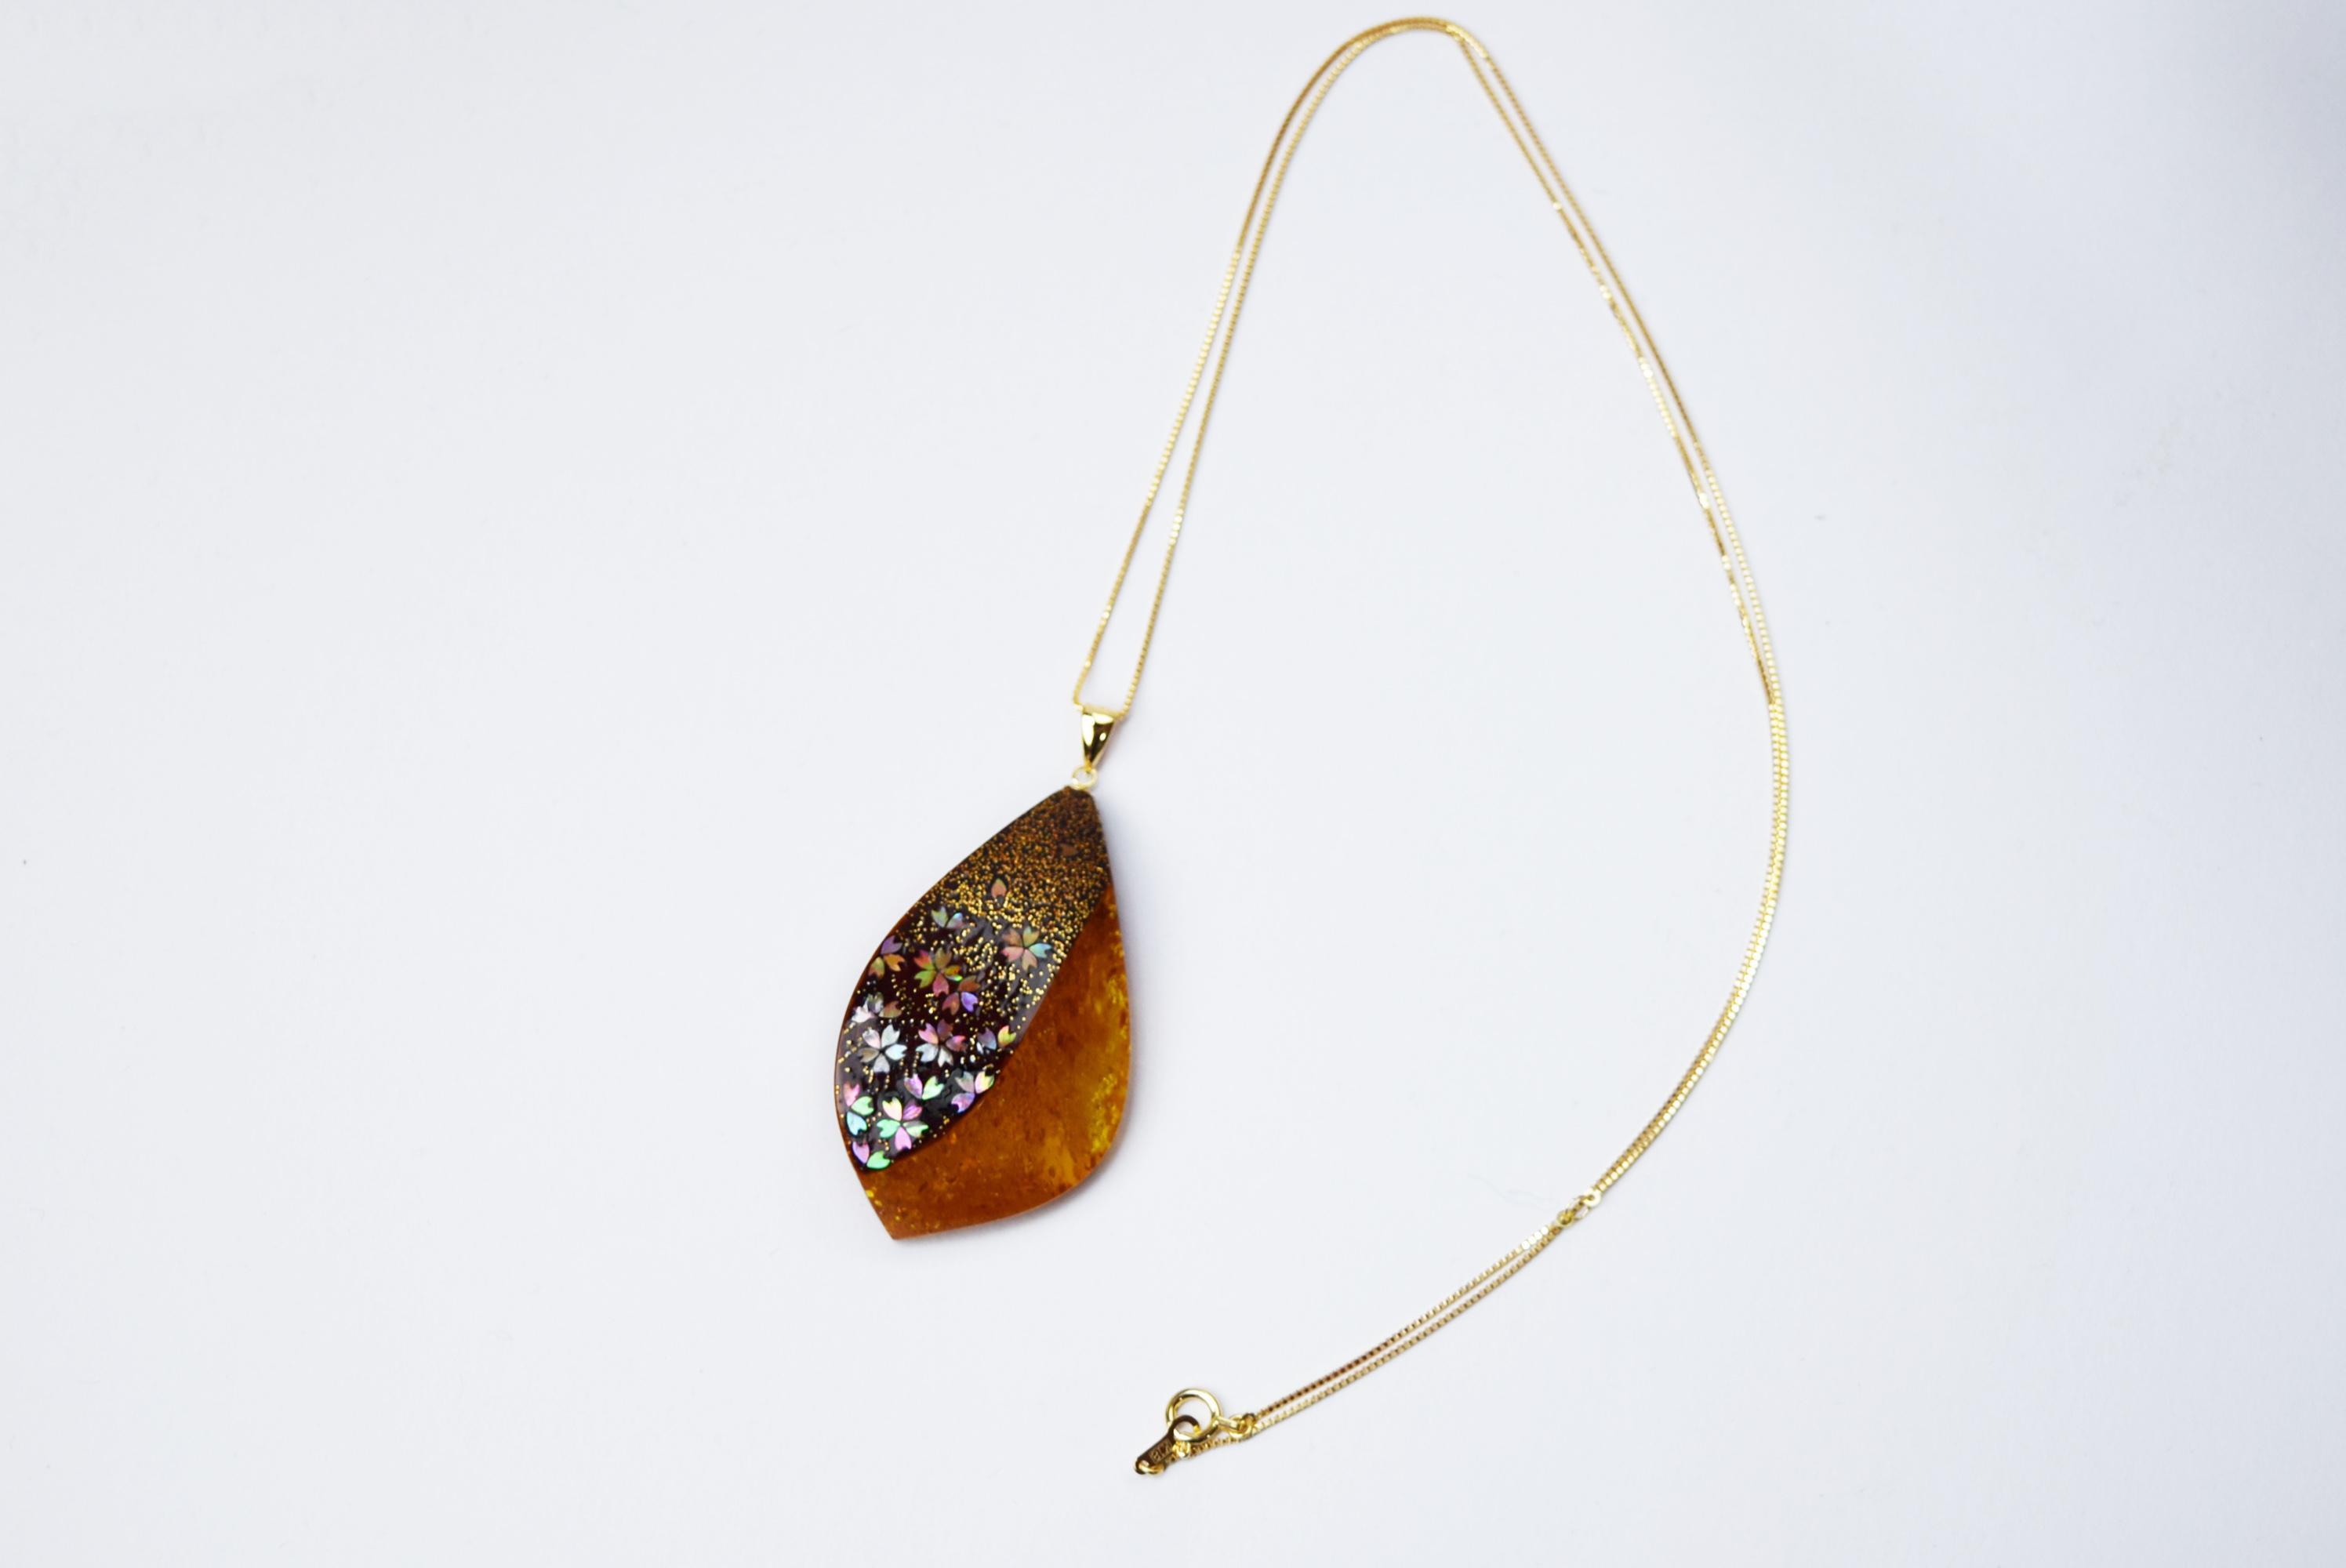 raden_necklace_mamori_amber25